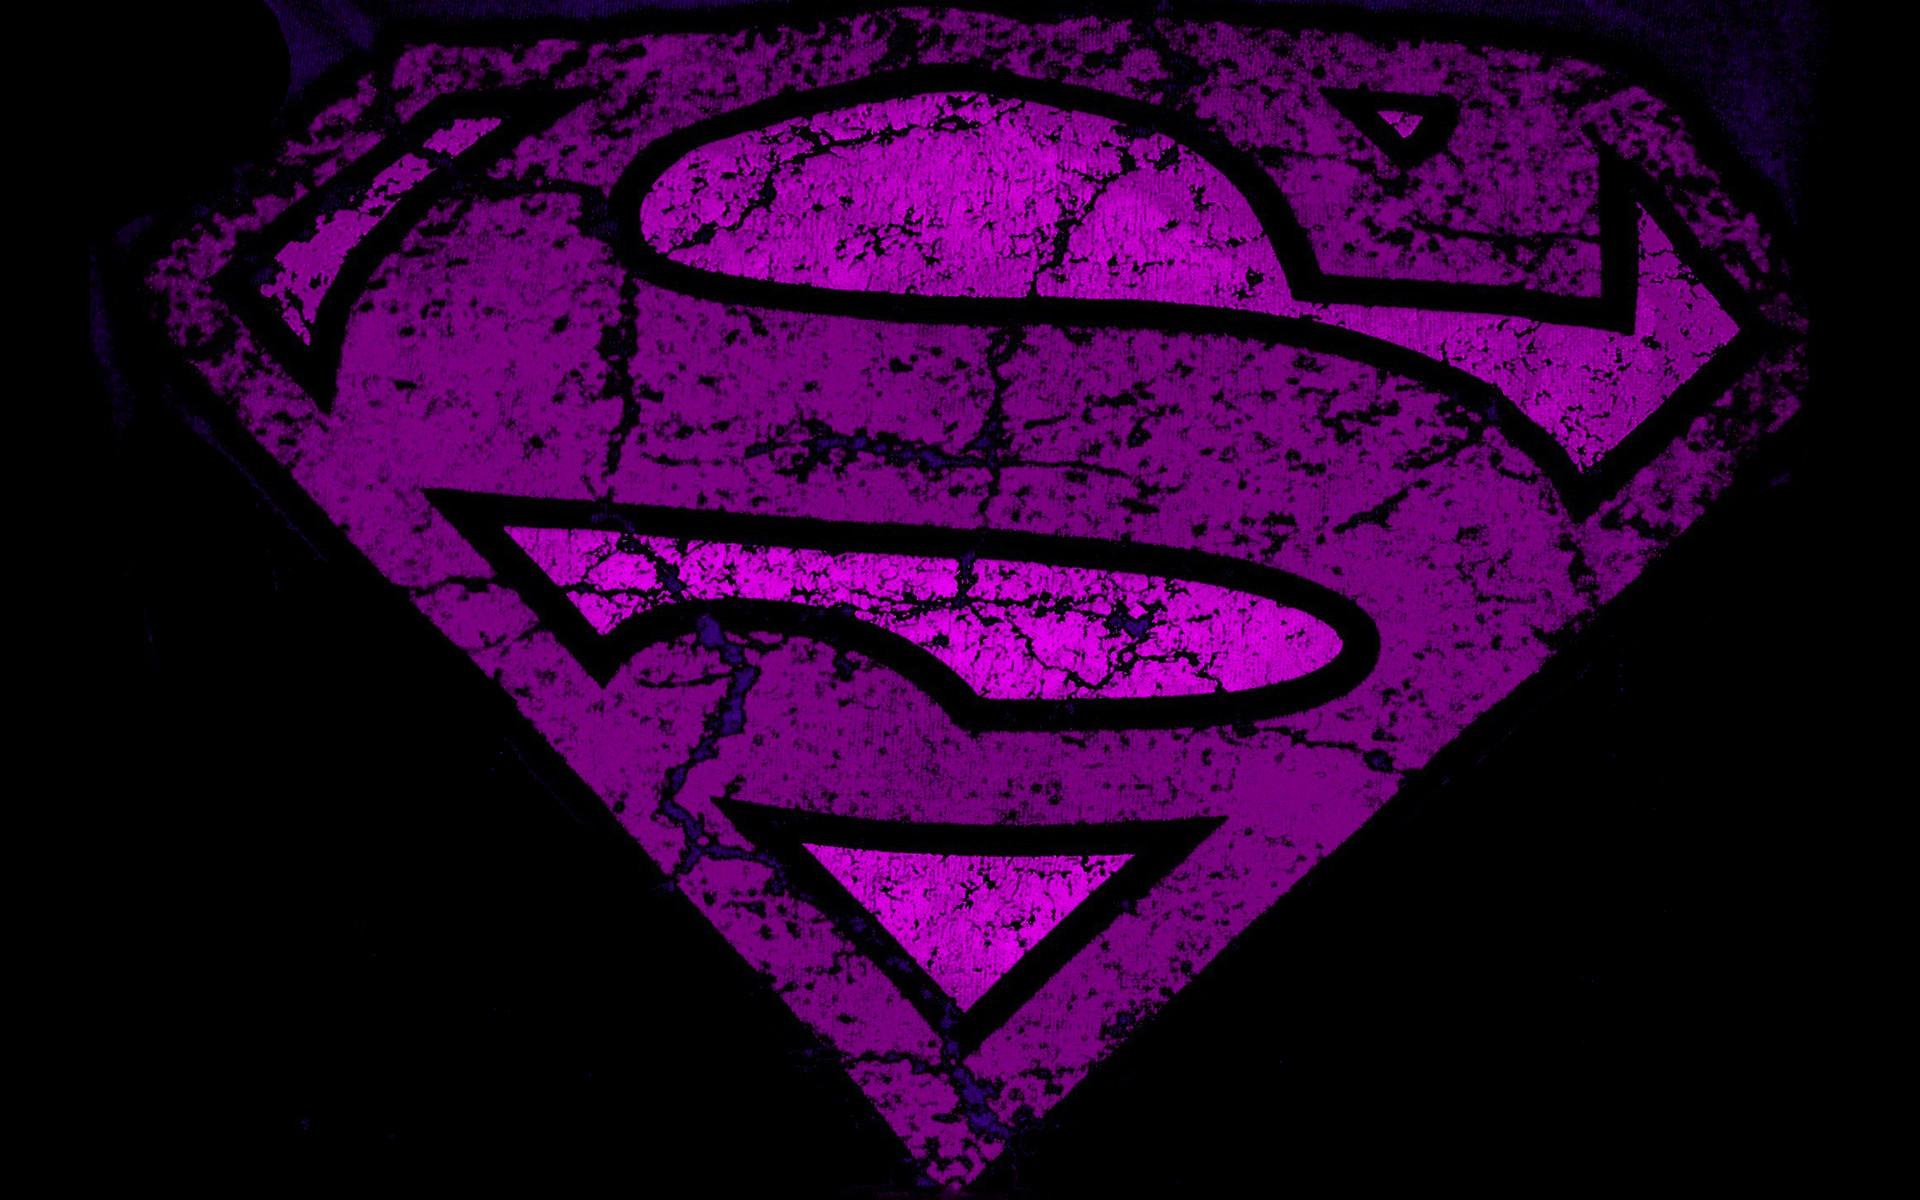 superman logo mobile wallpaper